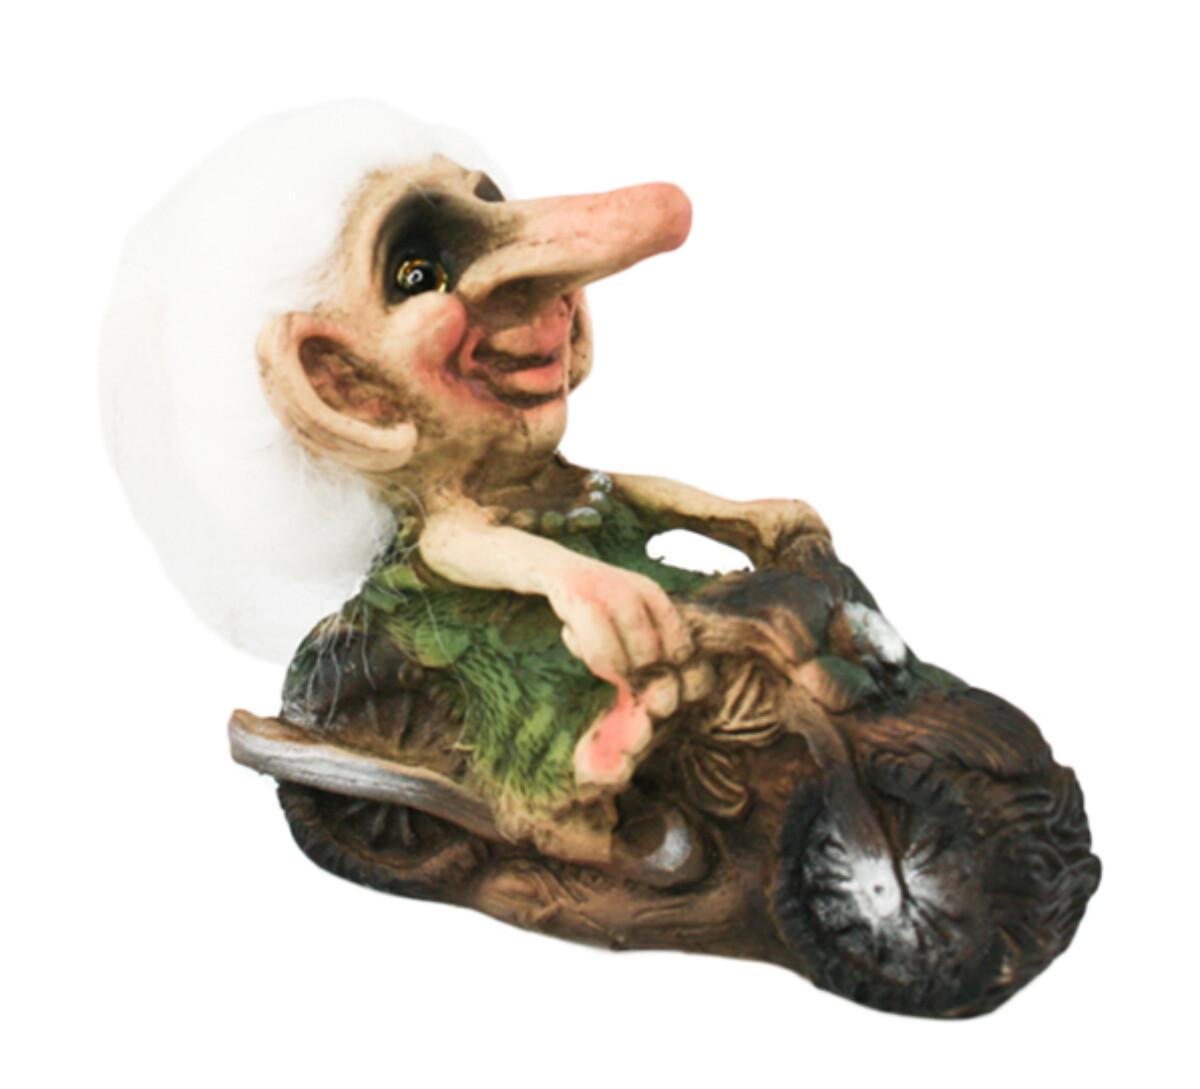 Troll lady driving motorbike (Troll # 005)